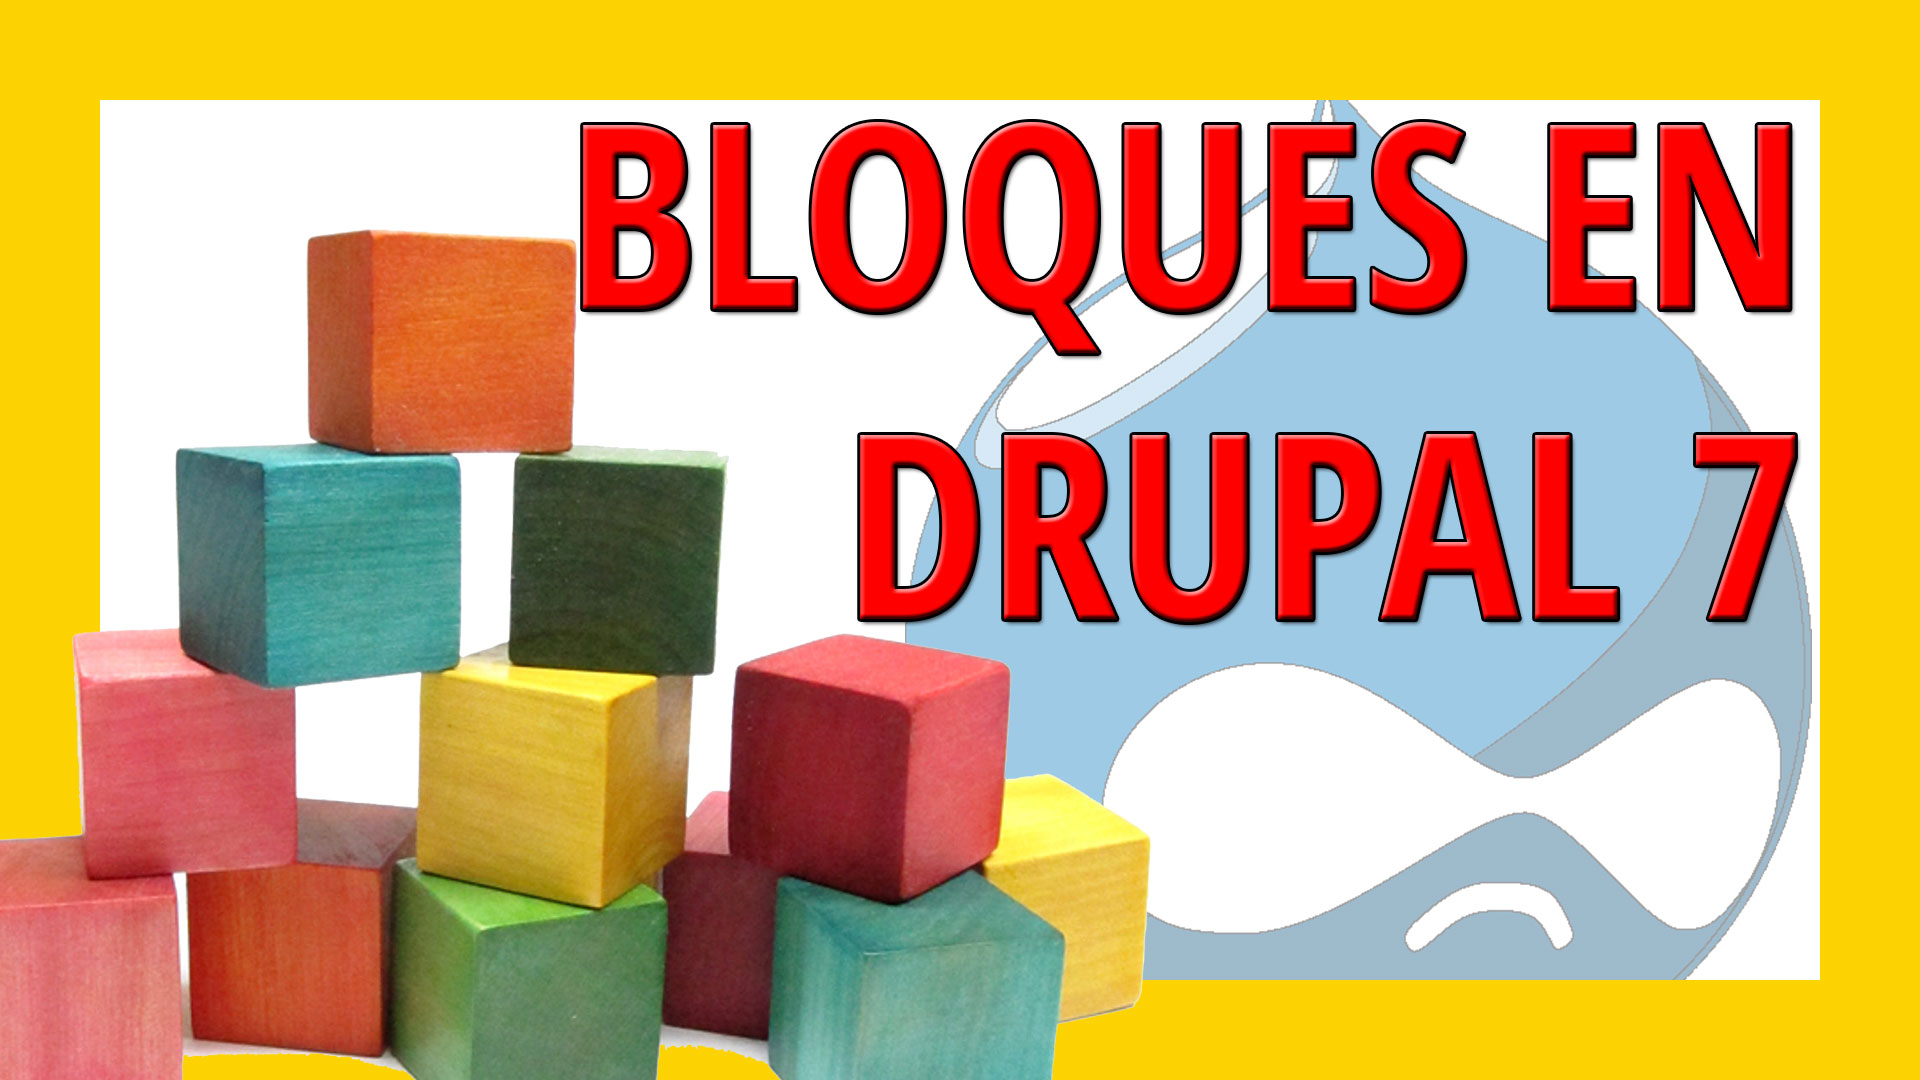 bloques en drupal 7